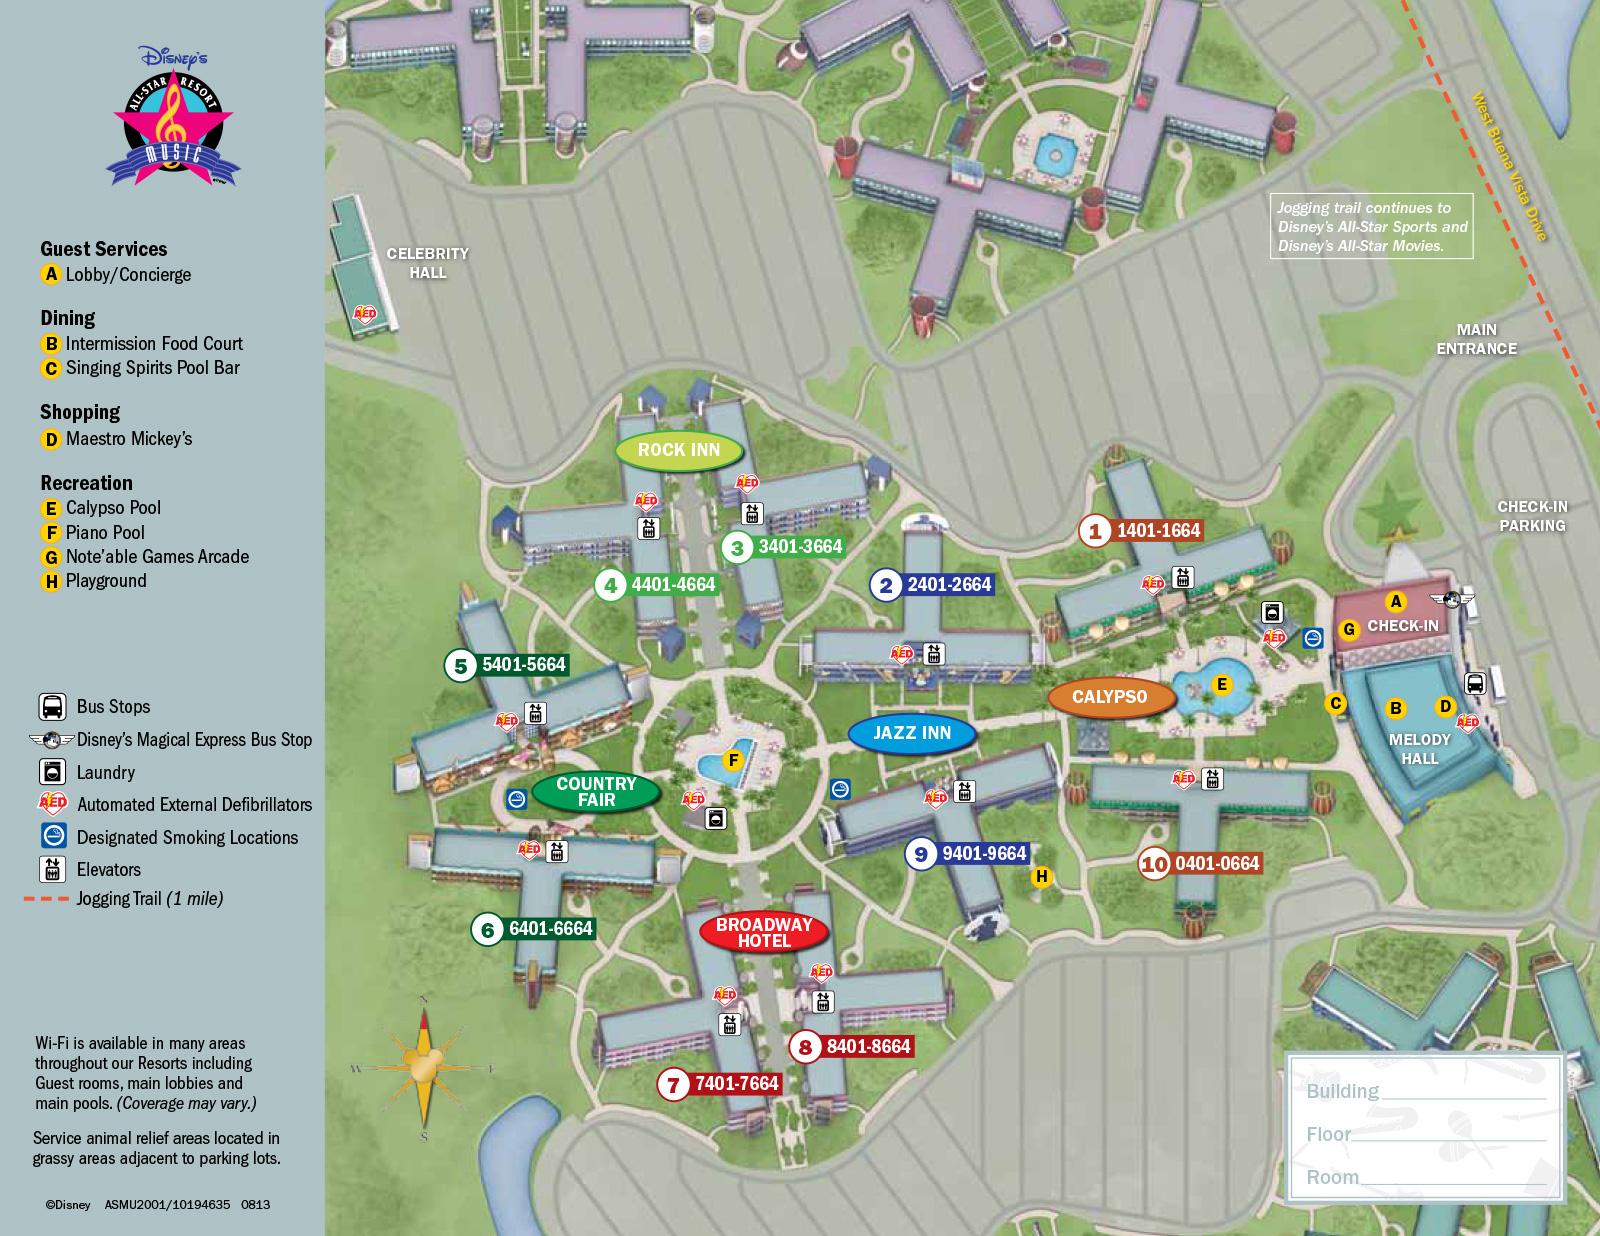 All Star Music Resort Map Disney's All Star Music Resort